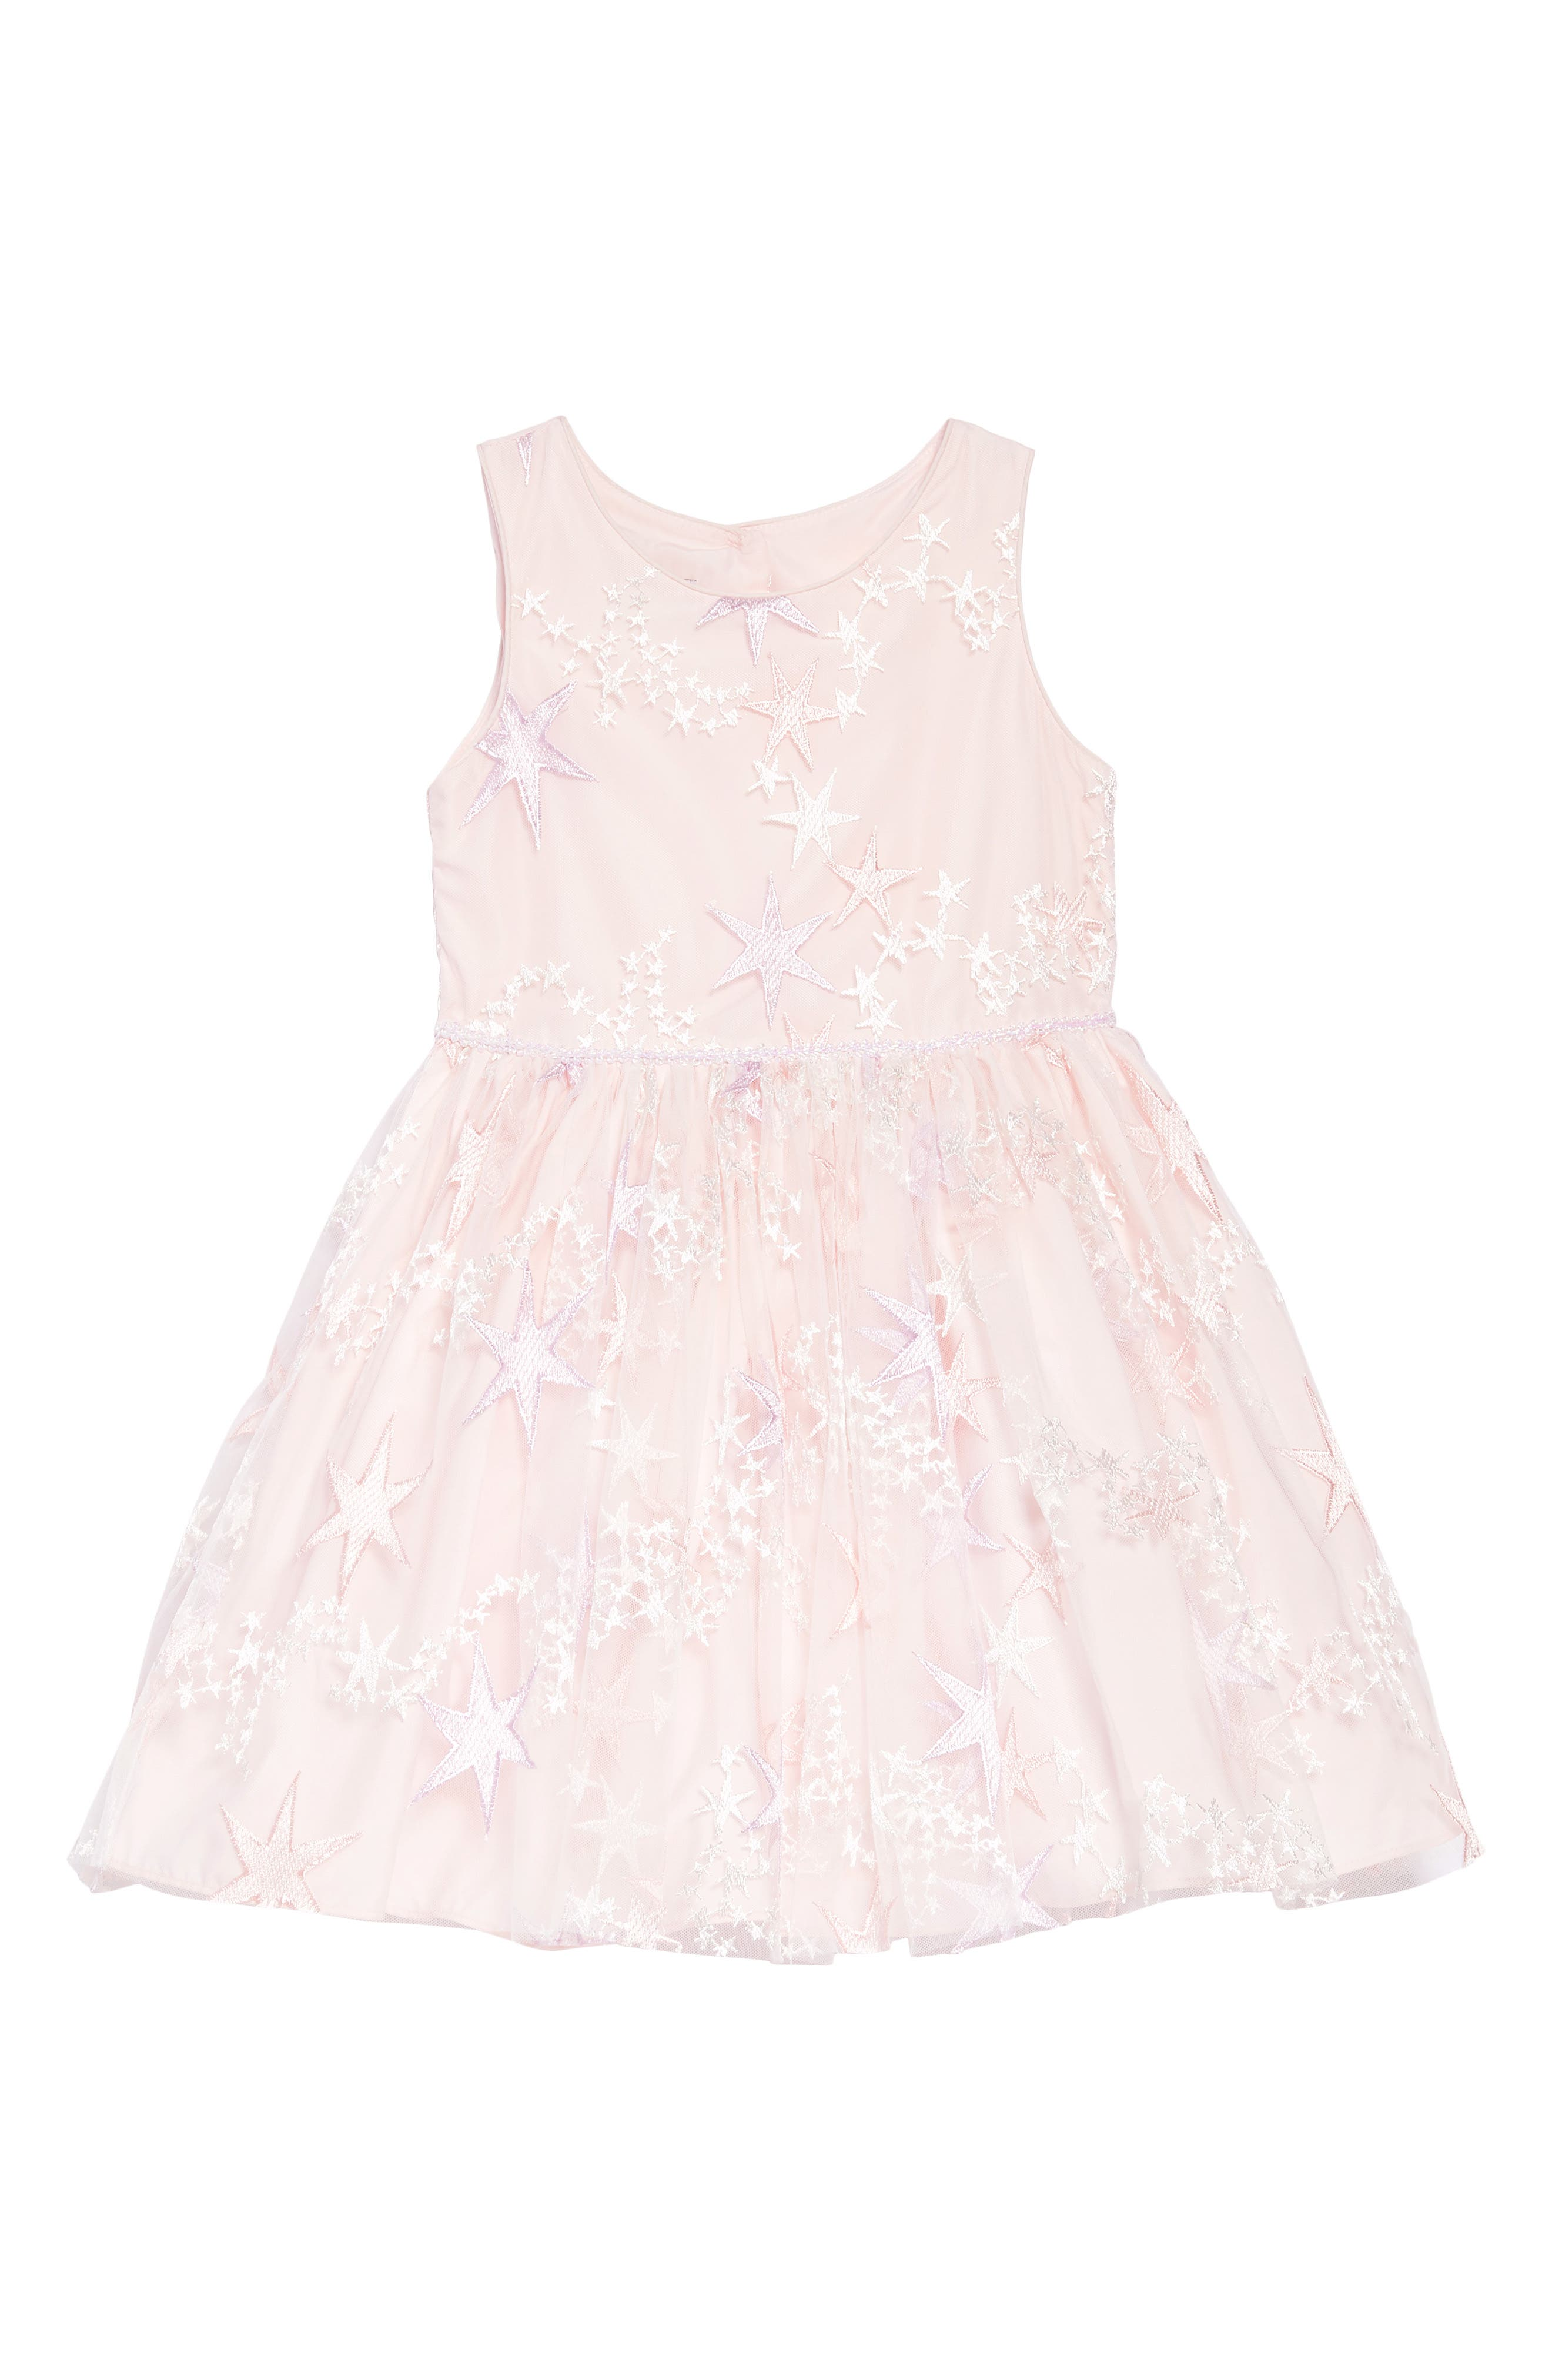 Main Image - Pippa & Julie Embroidered Star Dress (Toddler Girls, Little Girls & Big Girls)